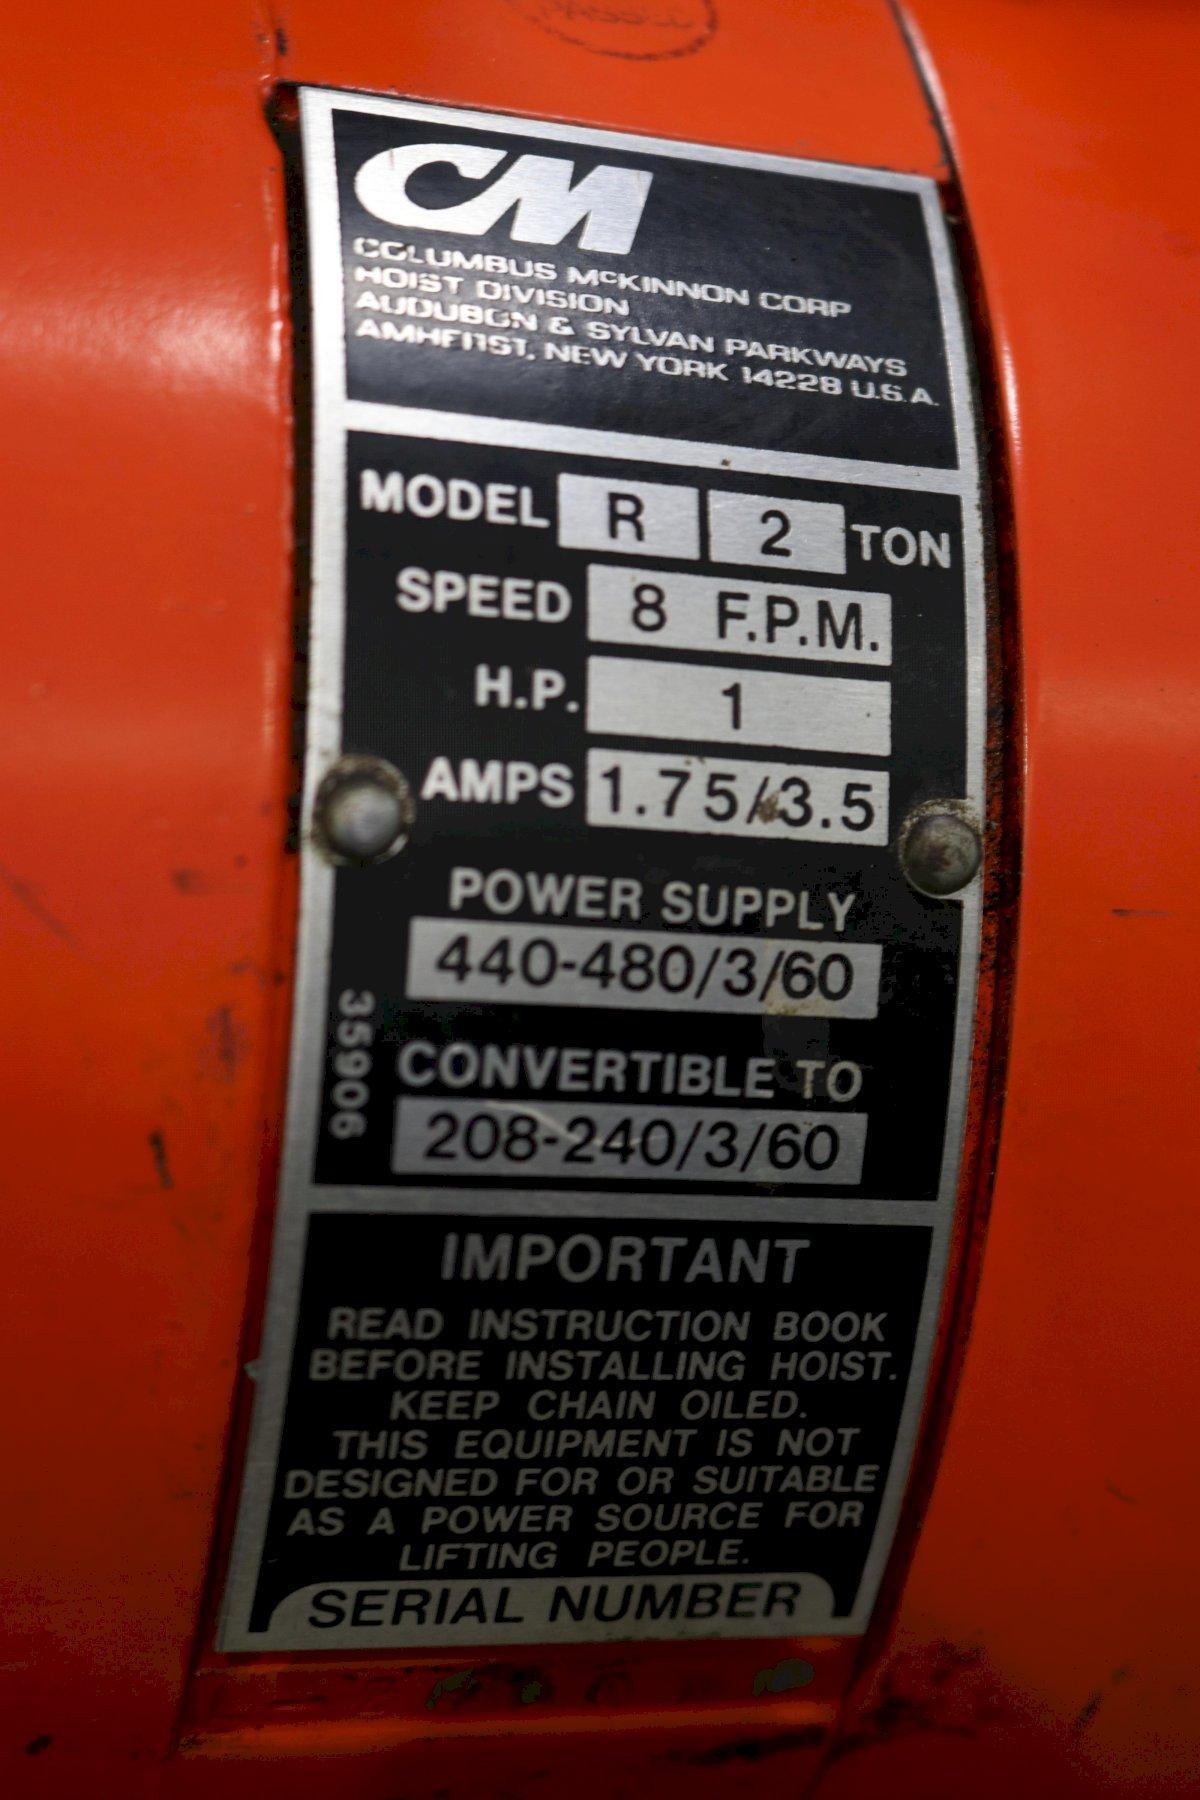 2 TON C & M ELECTRIC CHAIN HOIST: STOCK #73526